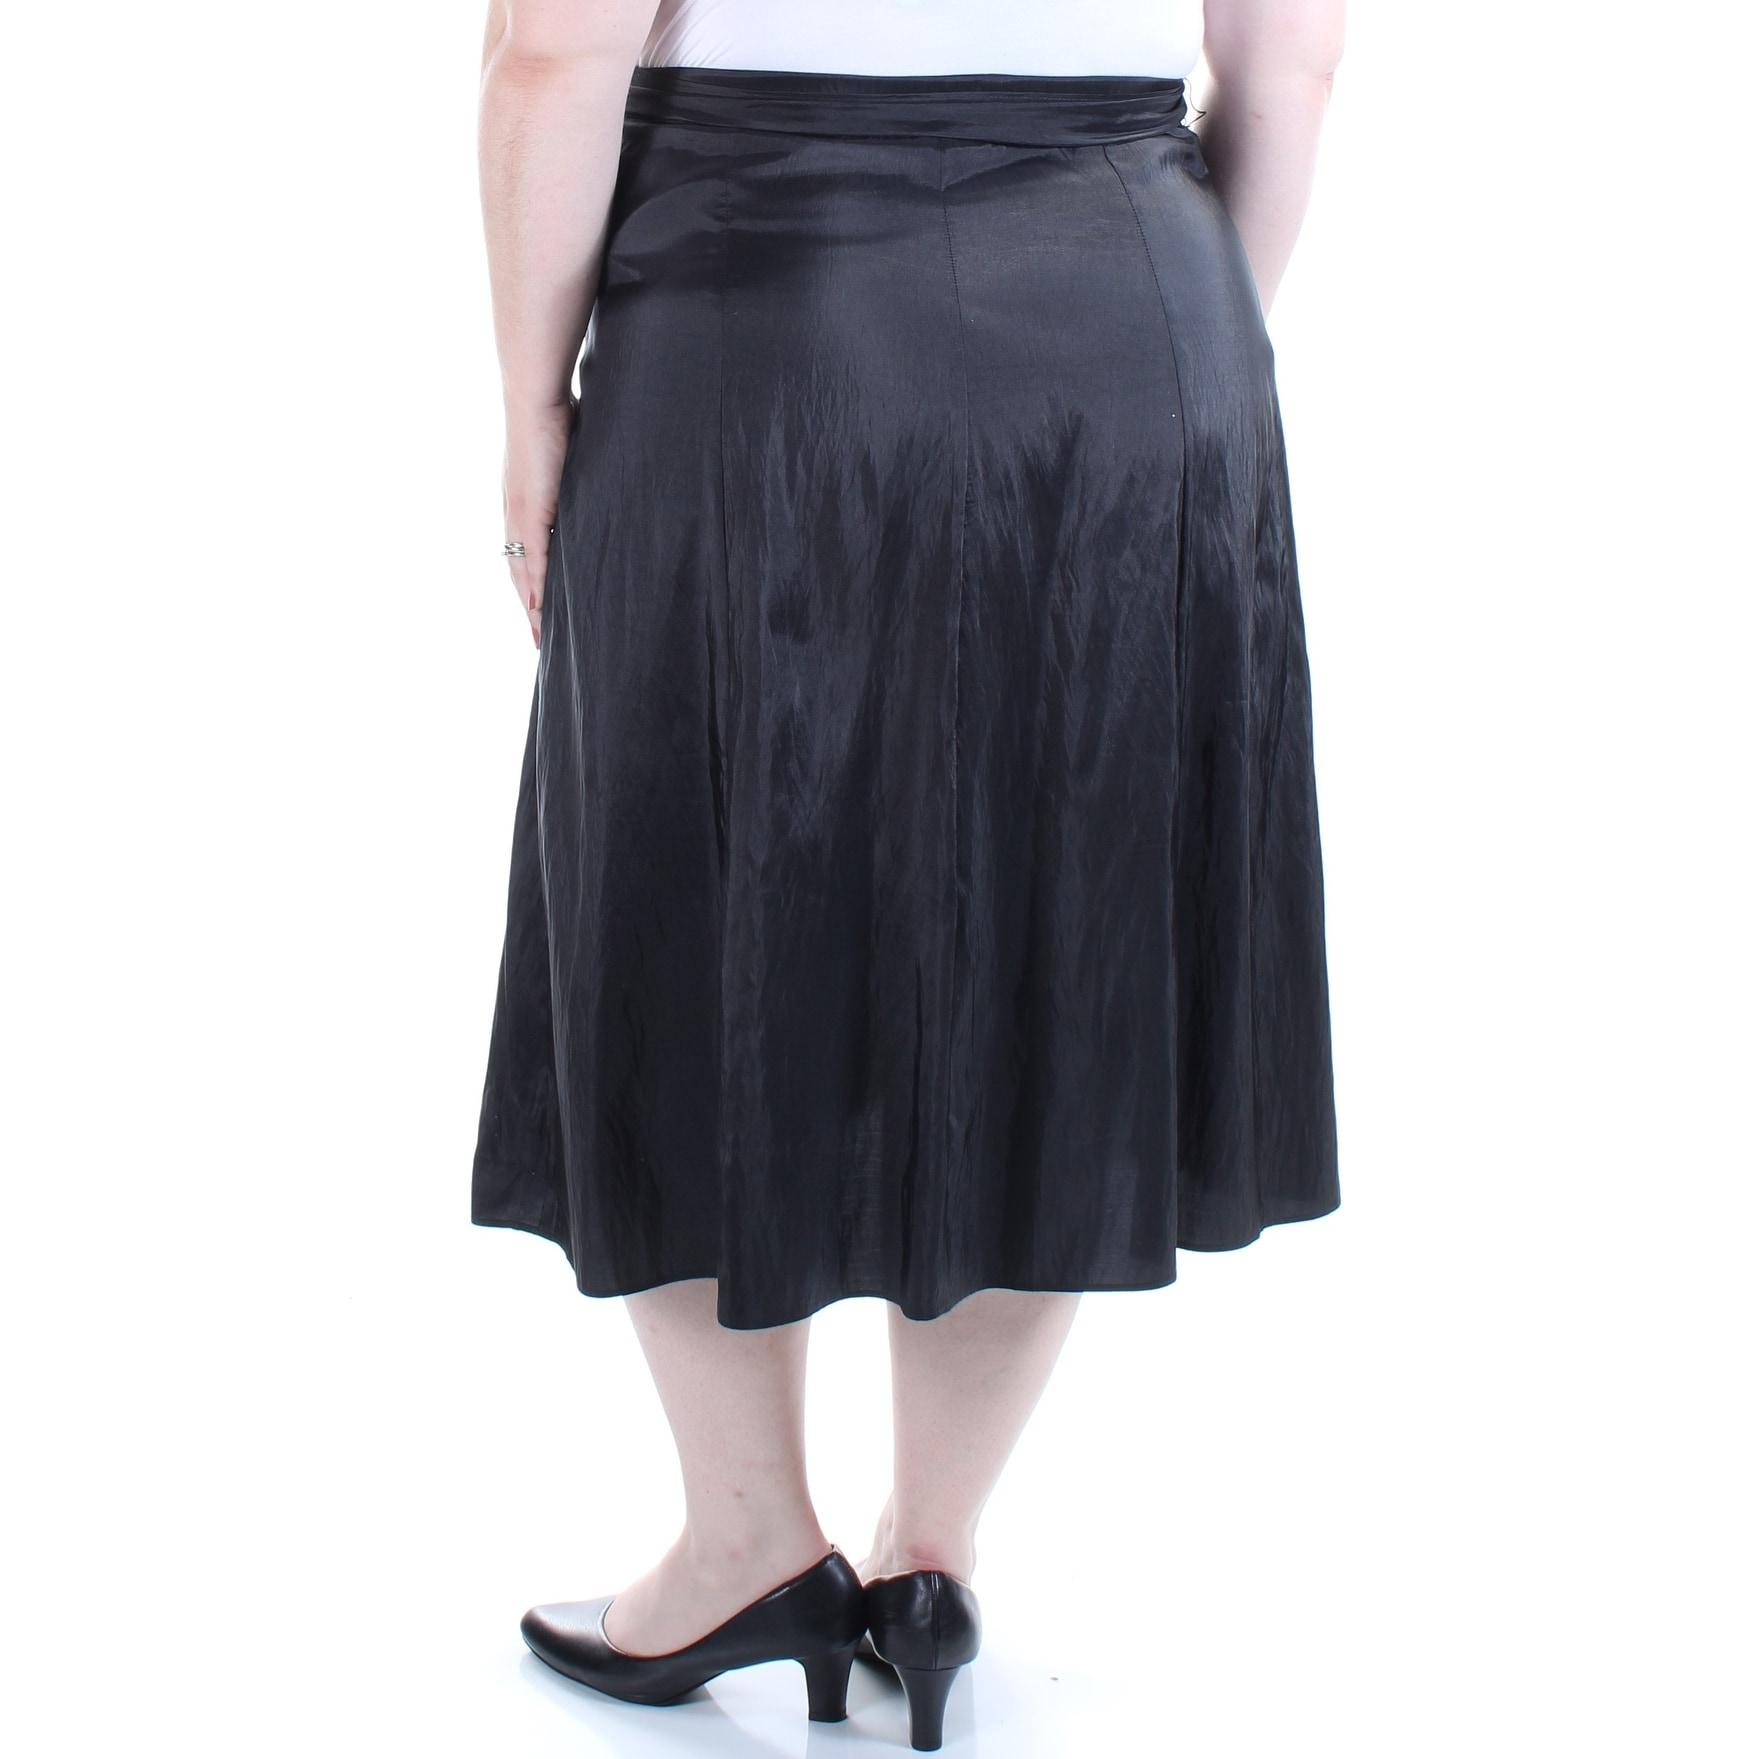 e472997d16f7f Shop MSK Womens Black Tea Length Skirt Plus Size  2X - Free Shipping On  Orders Over  45 - Overstock.com - 22424355